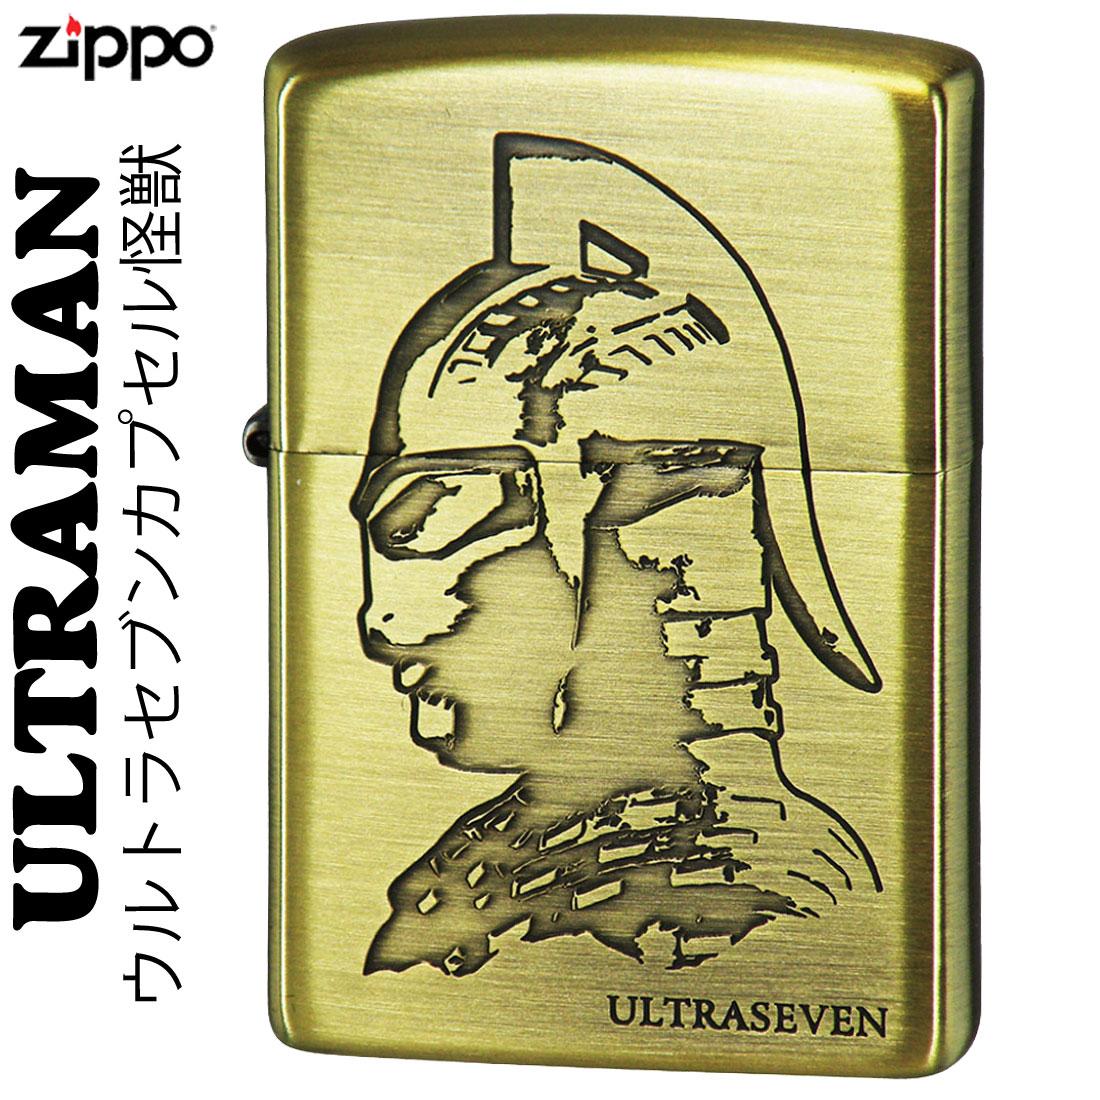 ZIPPO/ウルトラセブン カプセル怪獣 BS古美 UTR-E画像